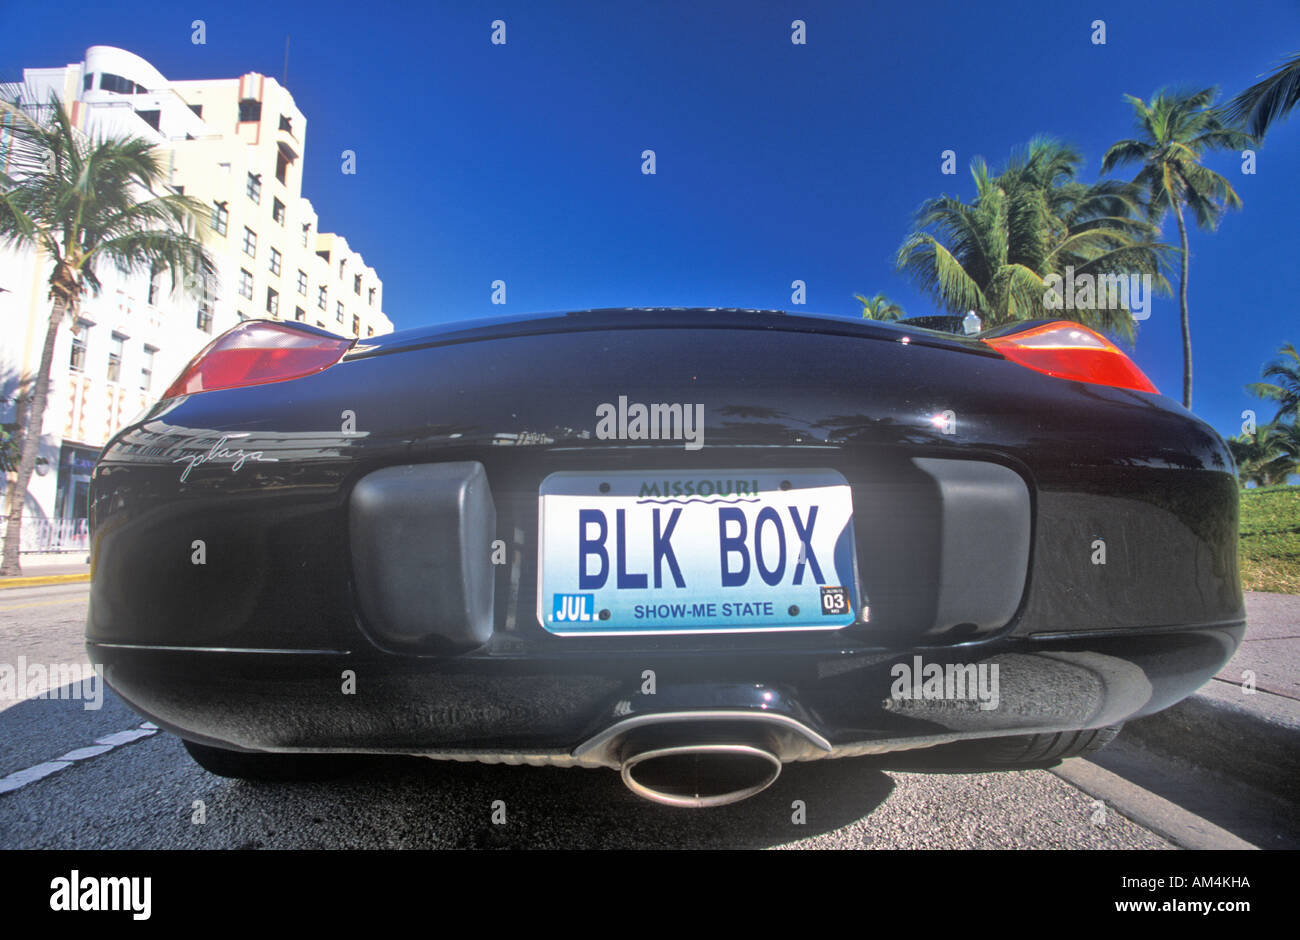 Black Box Vanity License Plate On The Back Of A South Beach Porsche Miami Florida